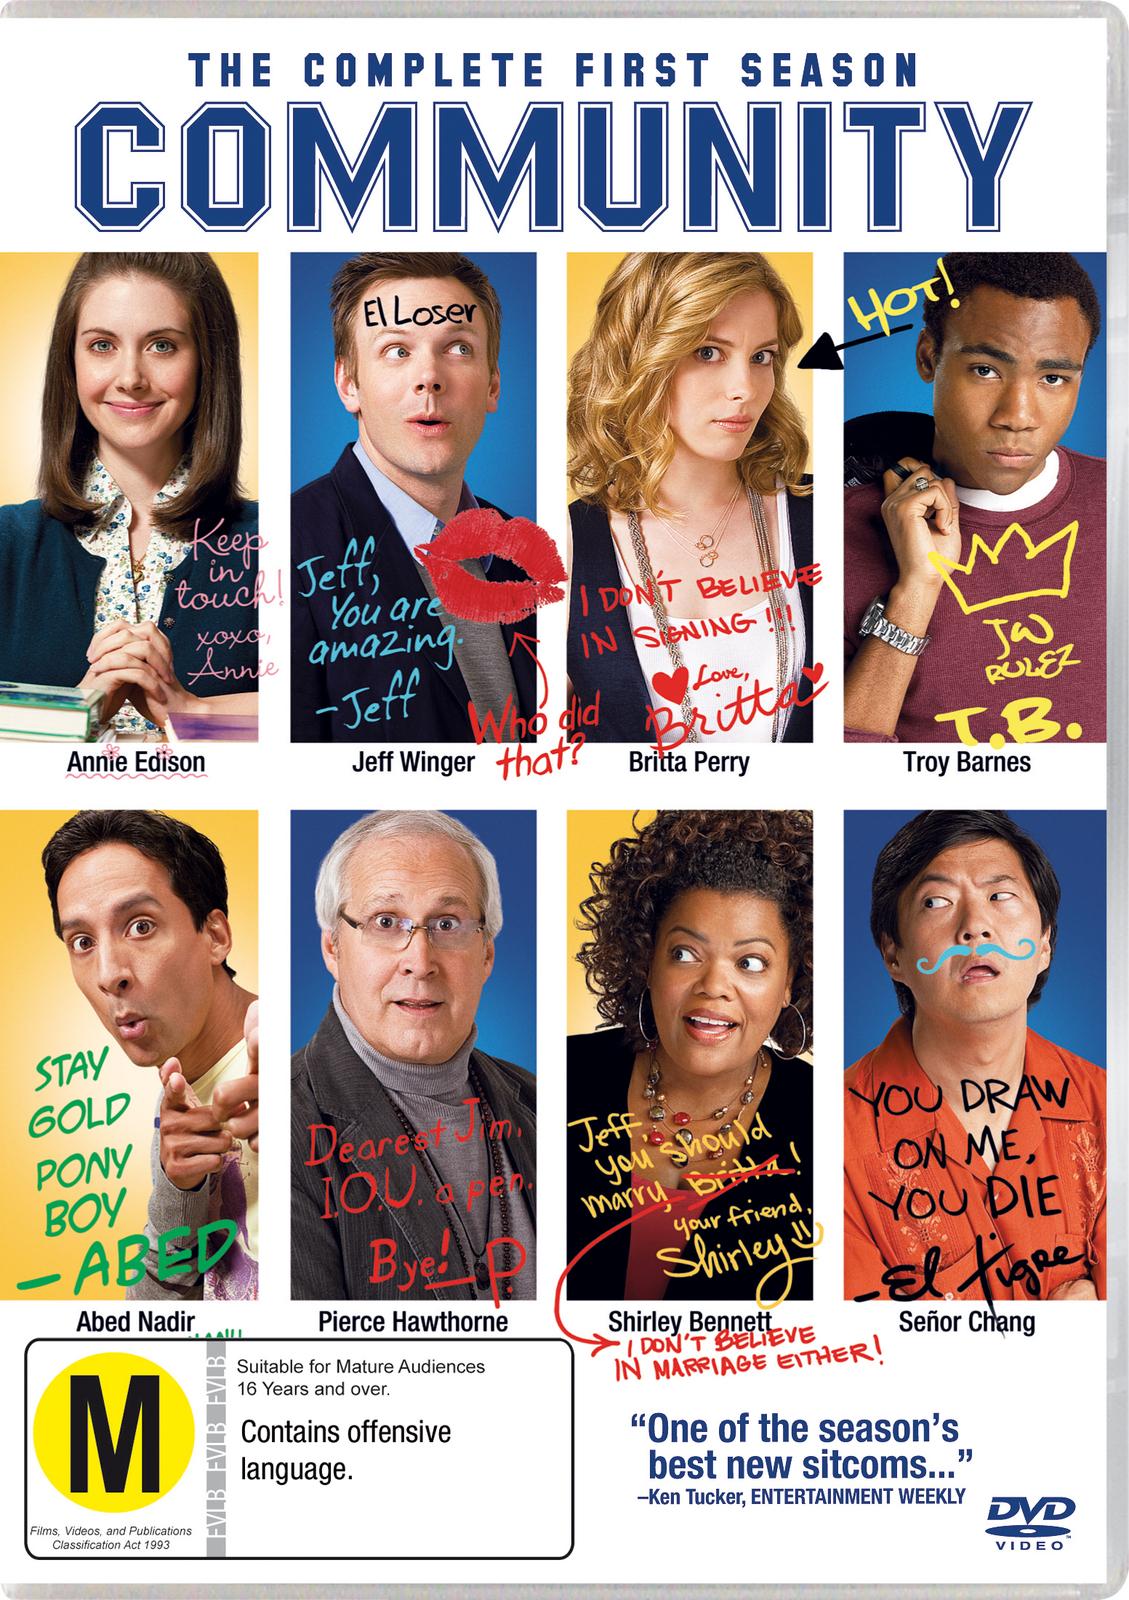 Community - The Complete 1st Season on DVD image